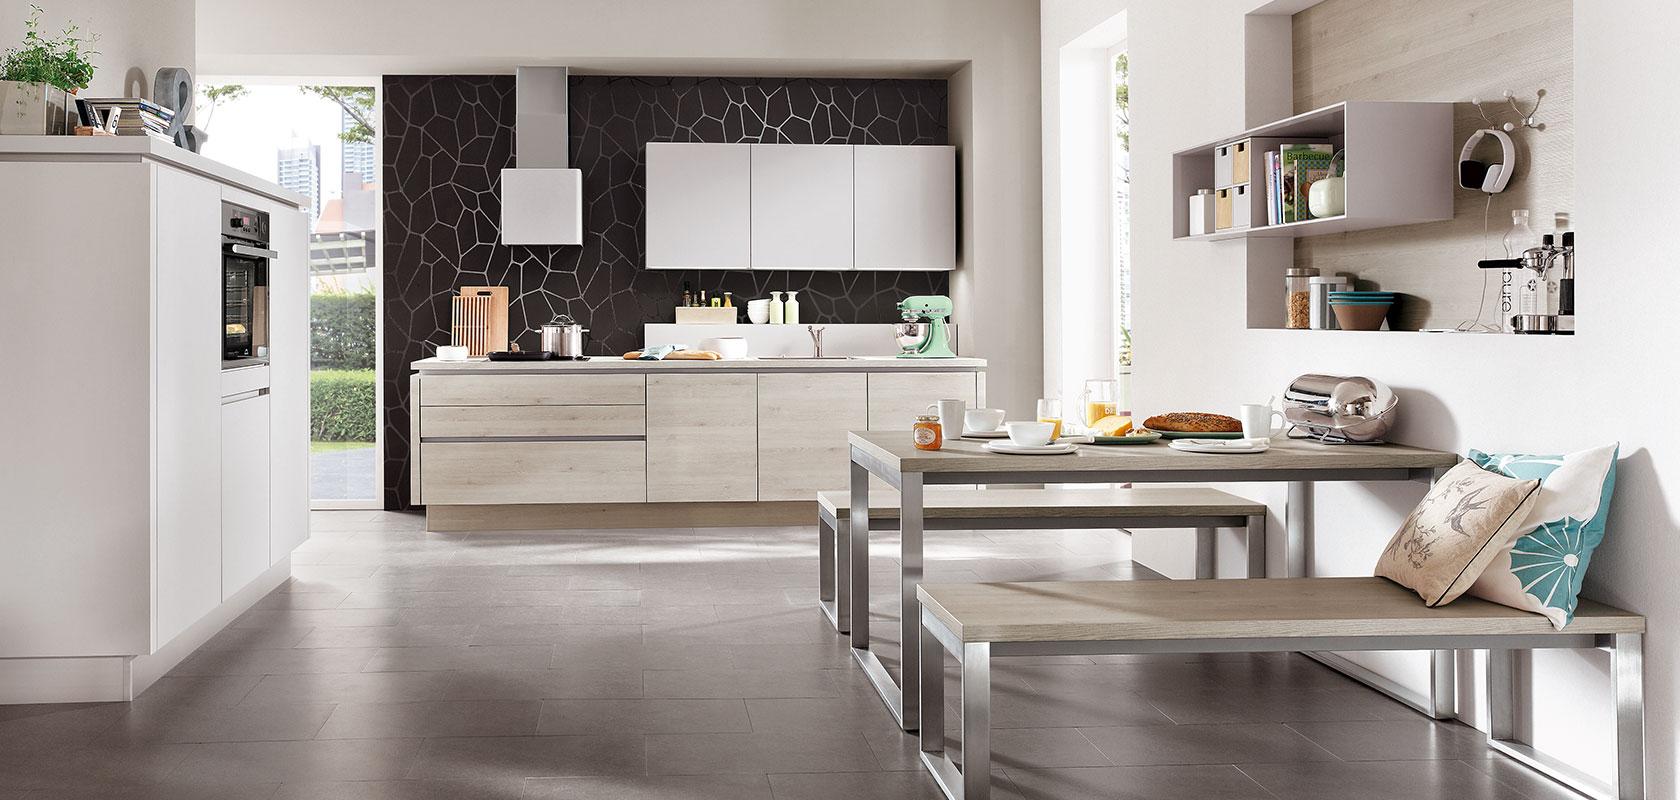 German Kitchens Bespoke Kitchen Lemon And Lime Interiors